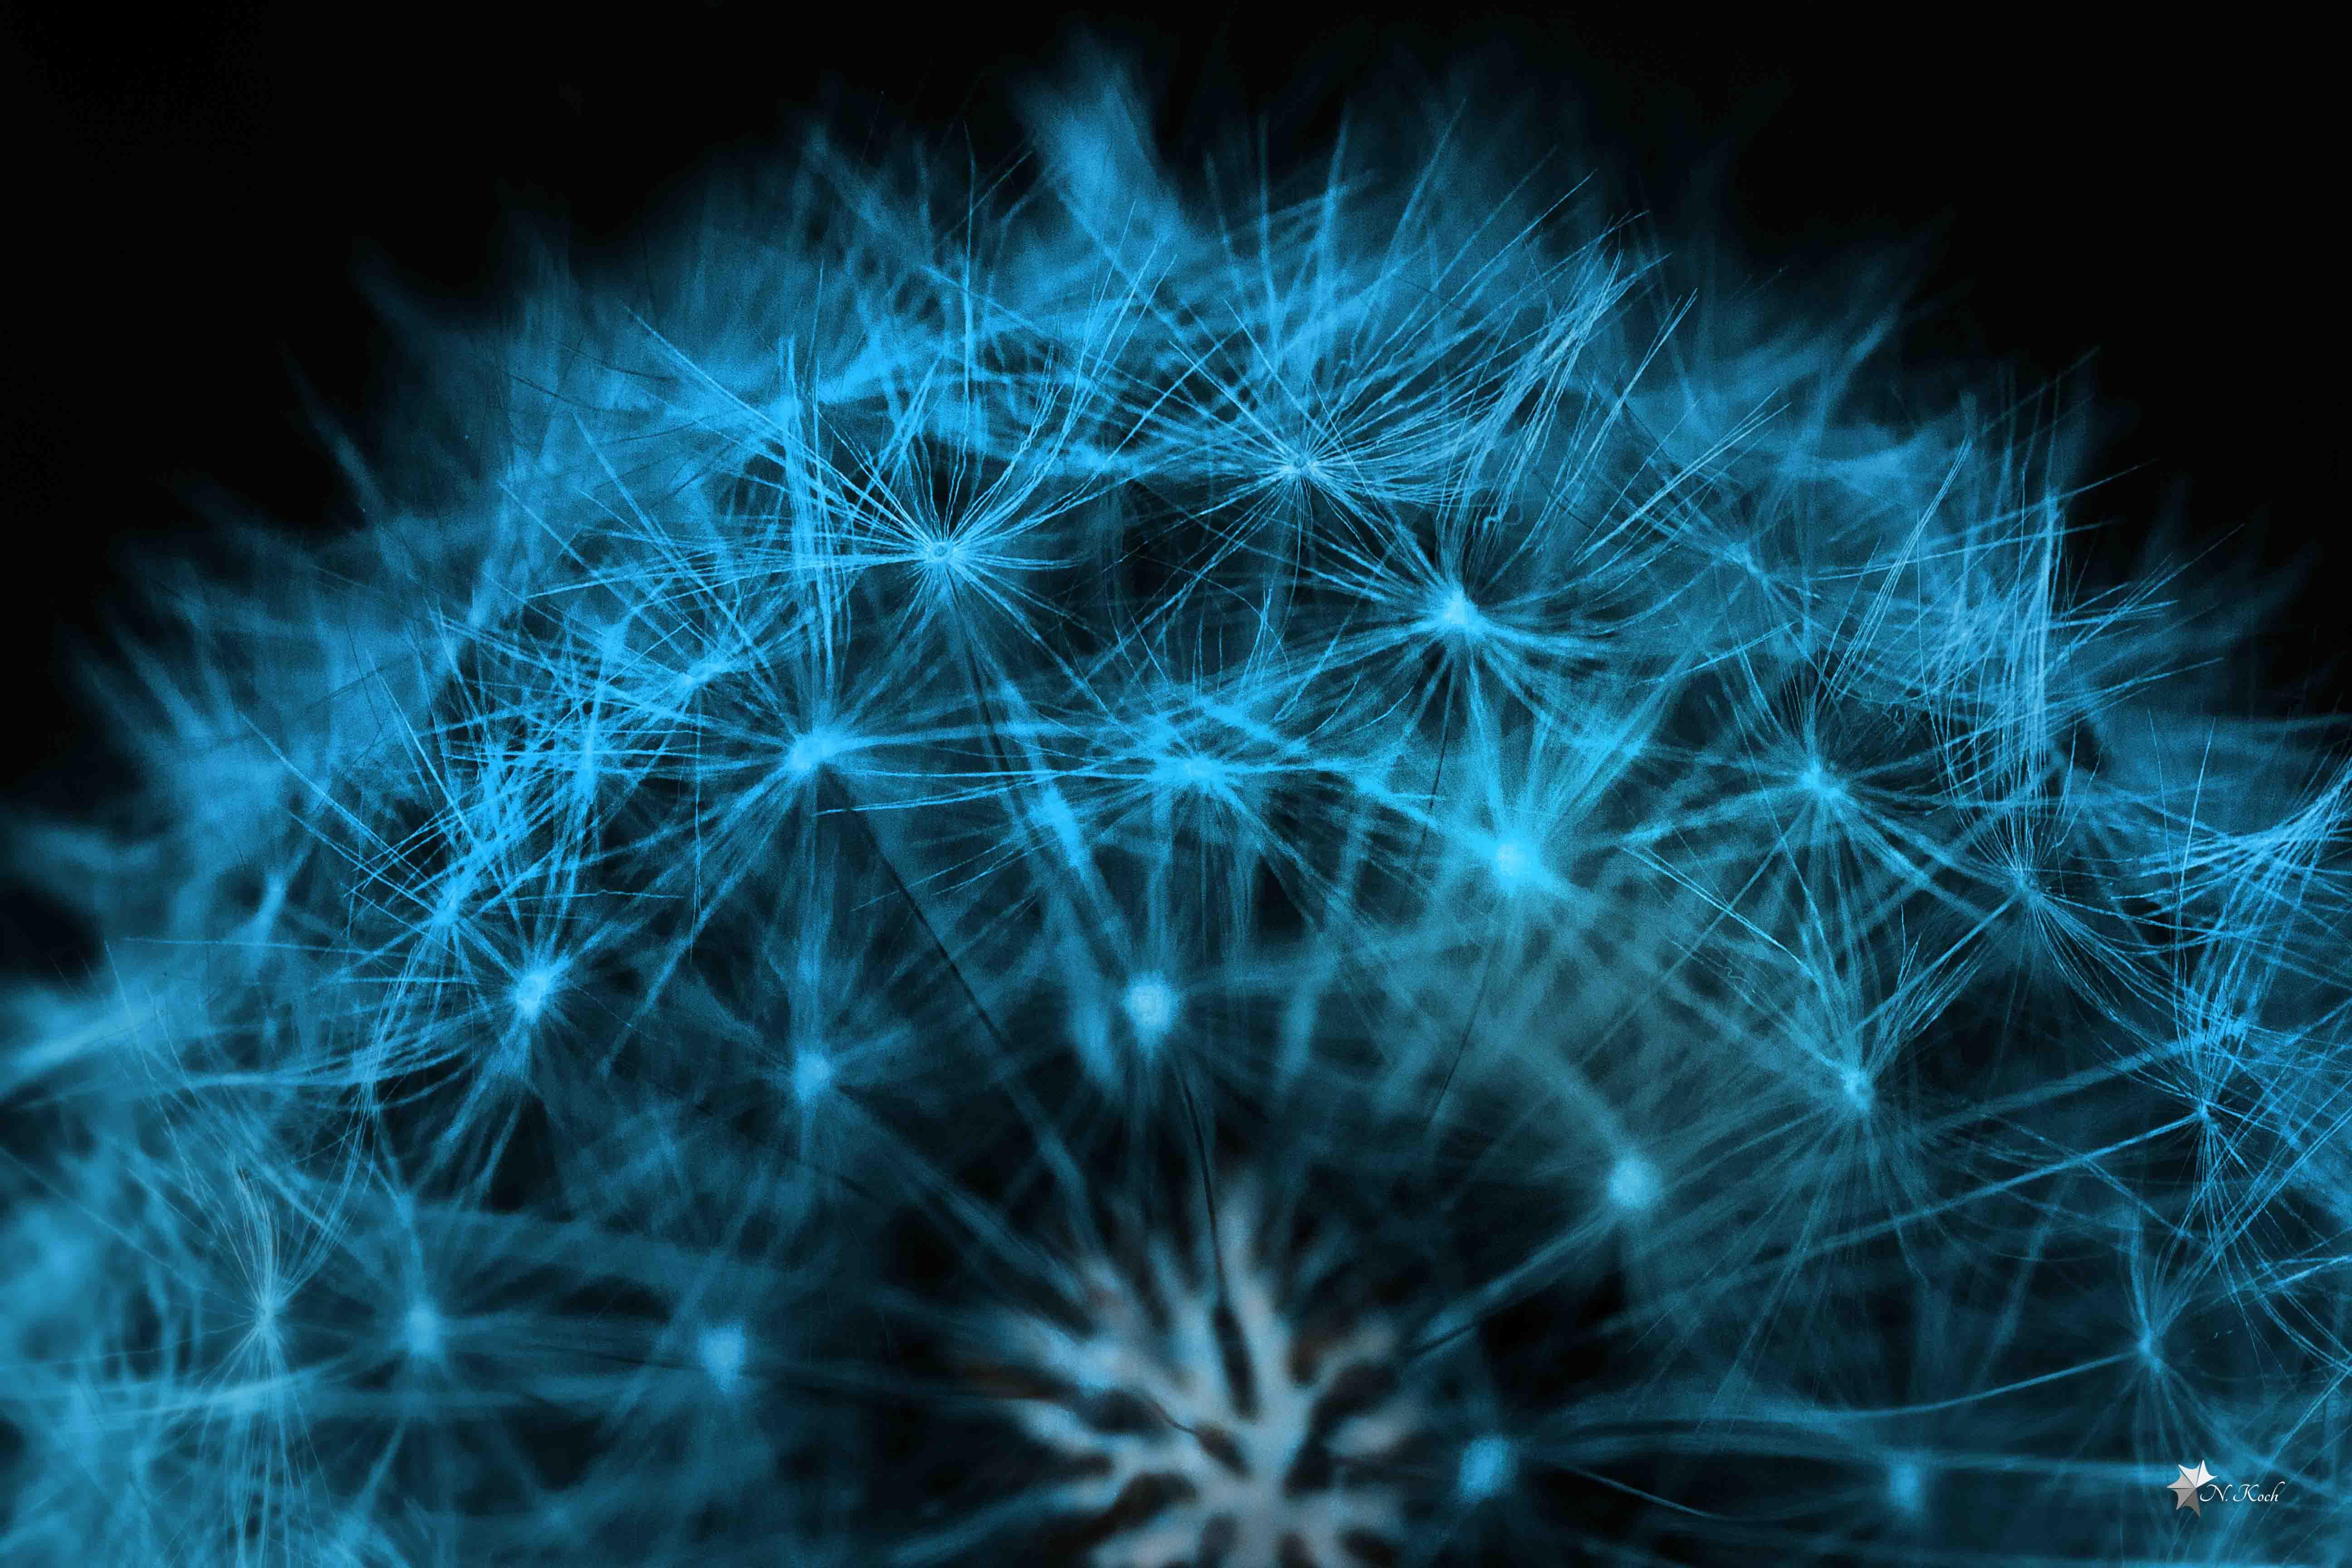 2014, Blue dandelion | Macro colorized